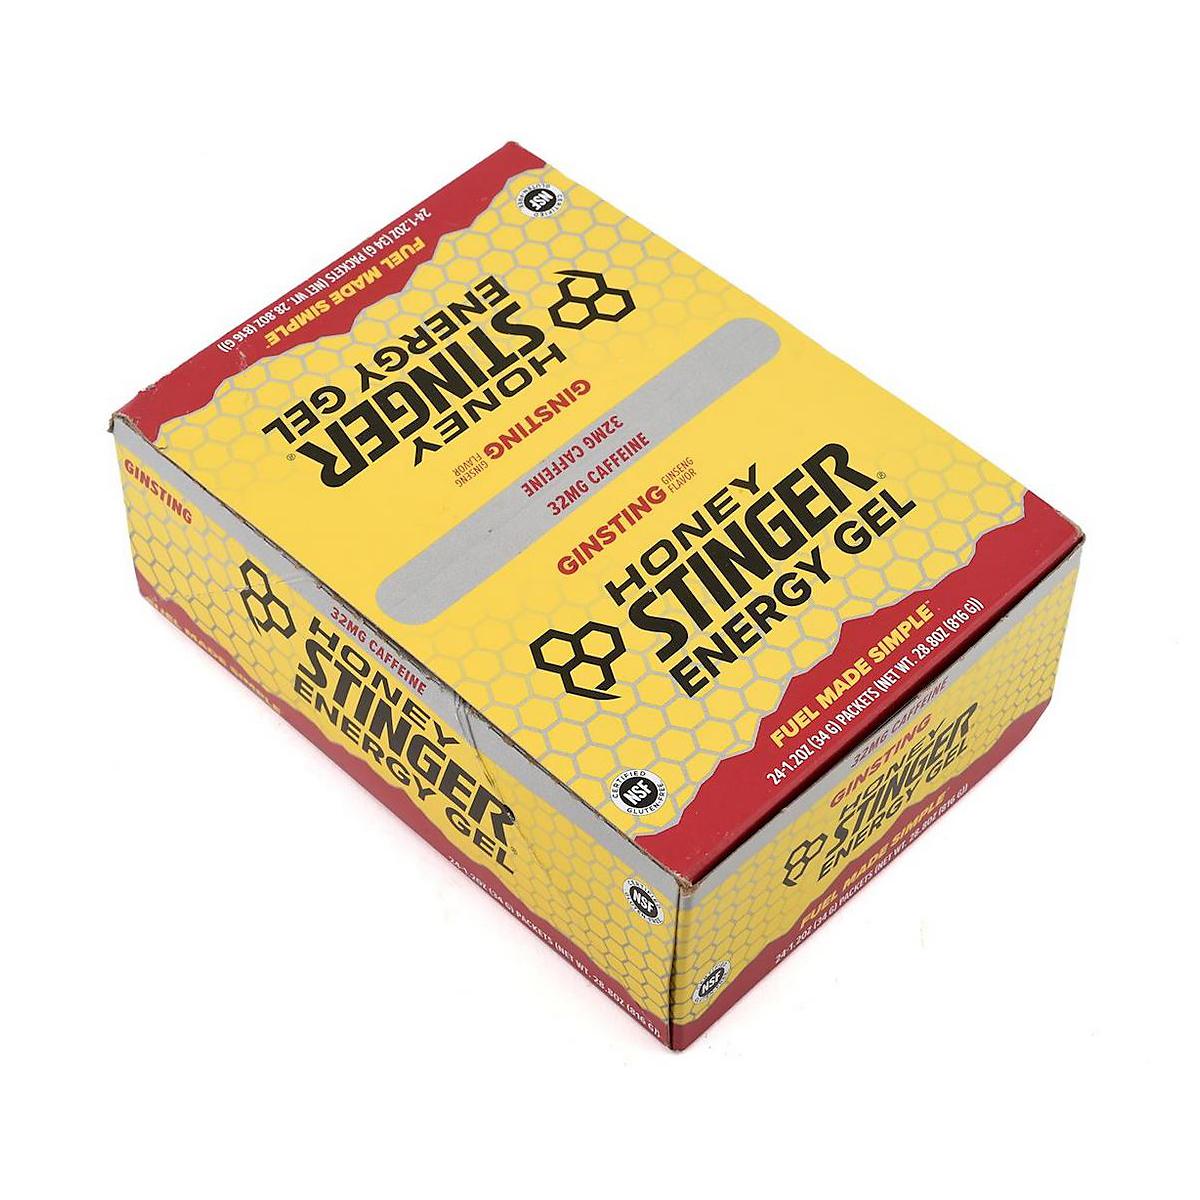 Honey Stinger Energy Gel - Flavor: Ginsting + Caffeine - Size: Box of 24, Caffeinated Ginsting, large, image 3